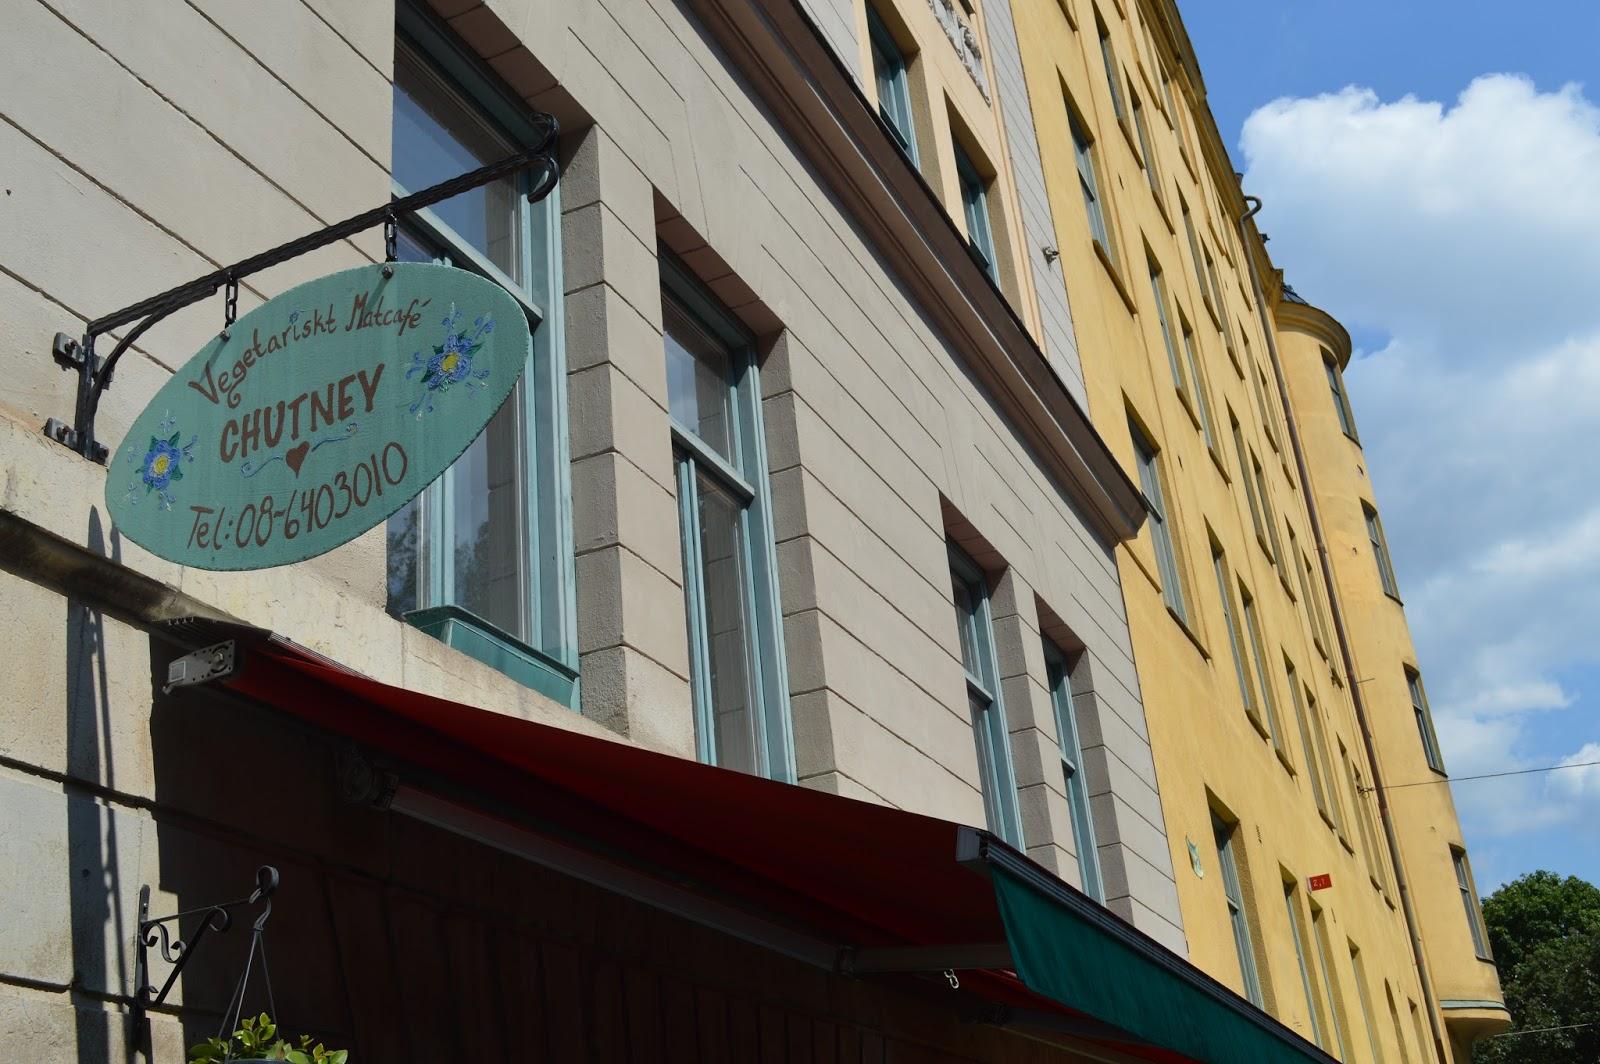 Chutney - Best vegetarian restaurant cafe in Södermalm, Stockholm